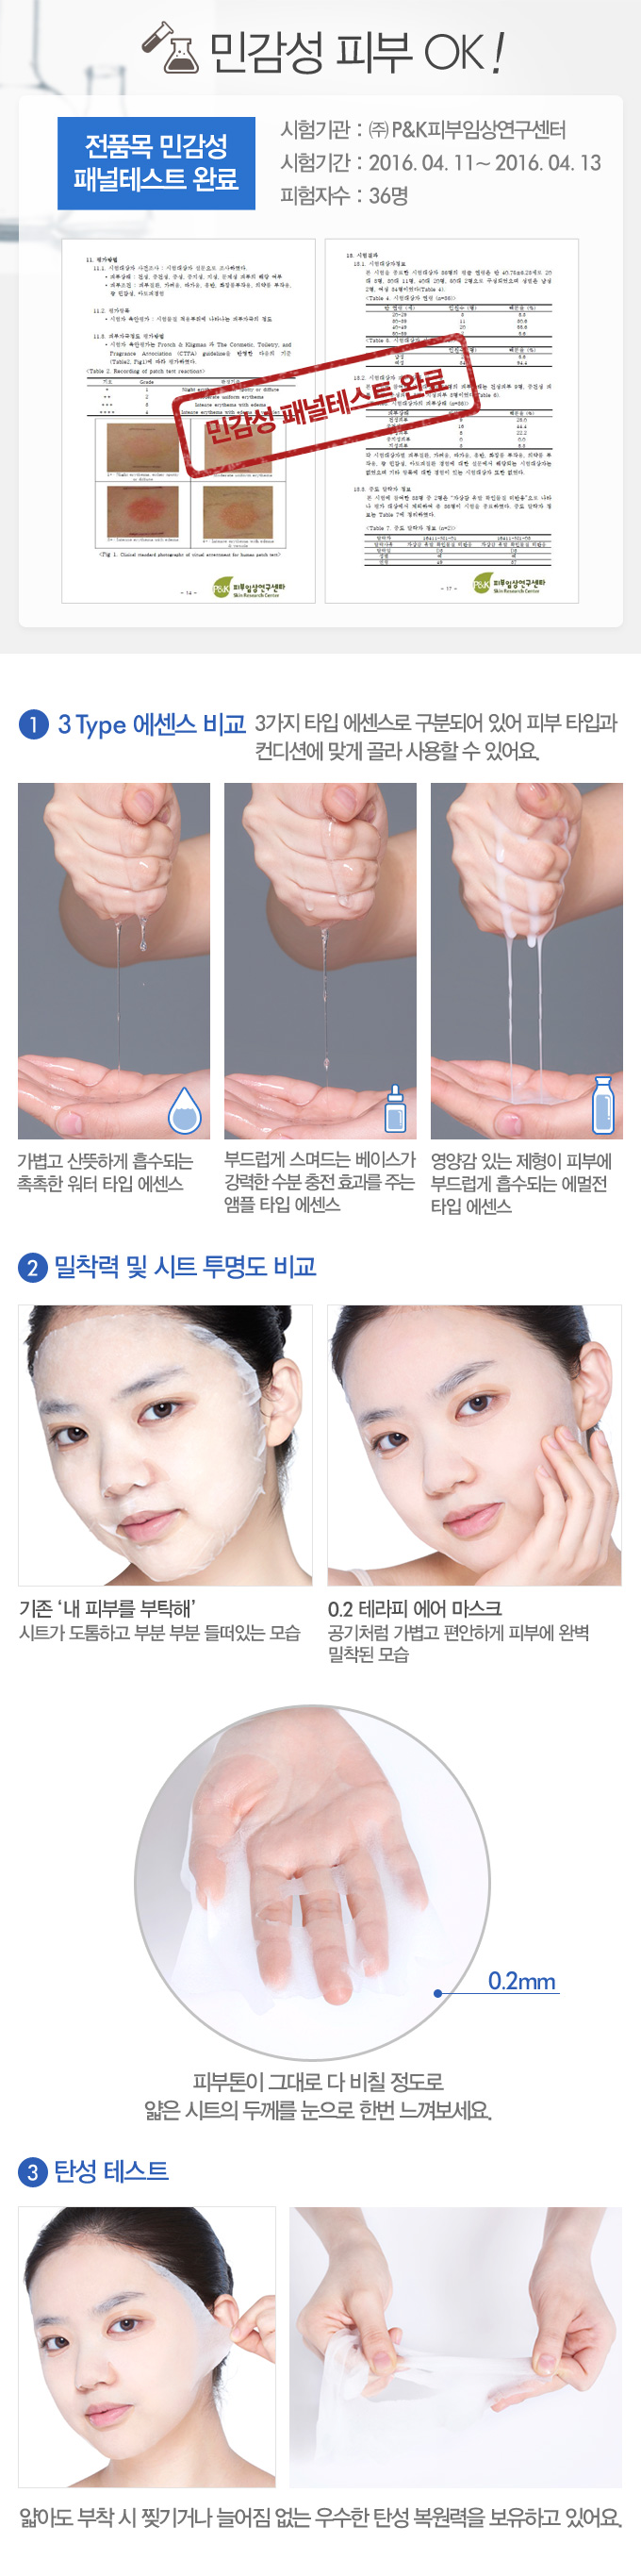 Etude House 02 Therapy Air Mask Manuka Honey Review 4702049 3 Pcs 20ml 3ea